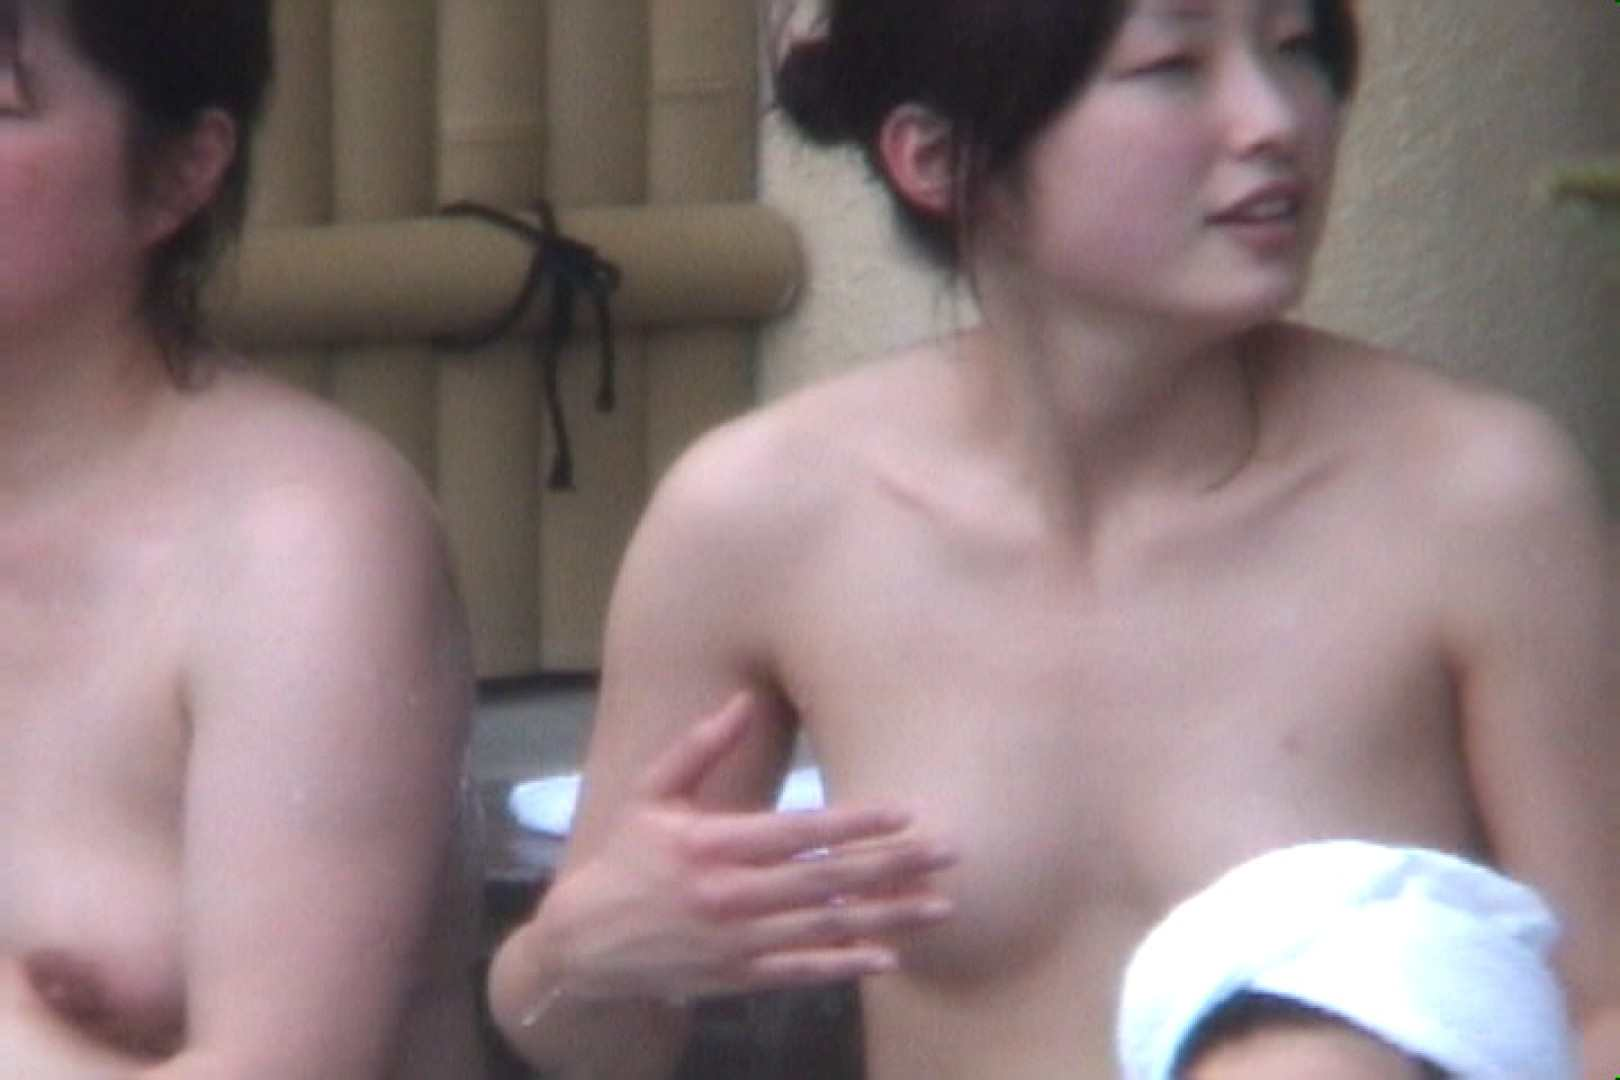 Aquaな露天風呂Vol.44【VIP限定】 盗撮大放出 セックス画像 72連発 38